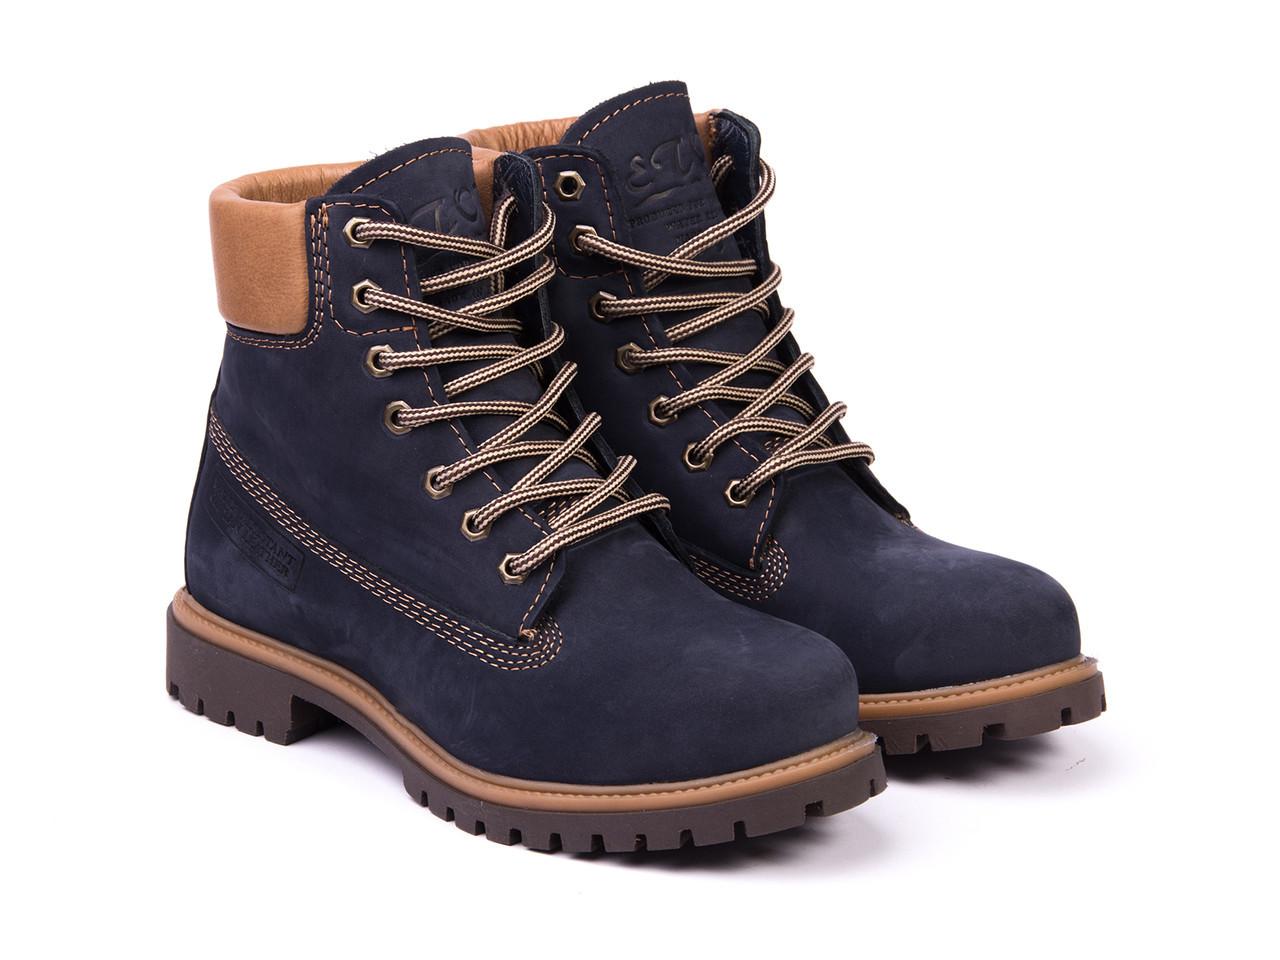 Ботинки Etor 9916-2298 40 синие